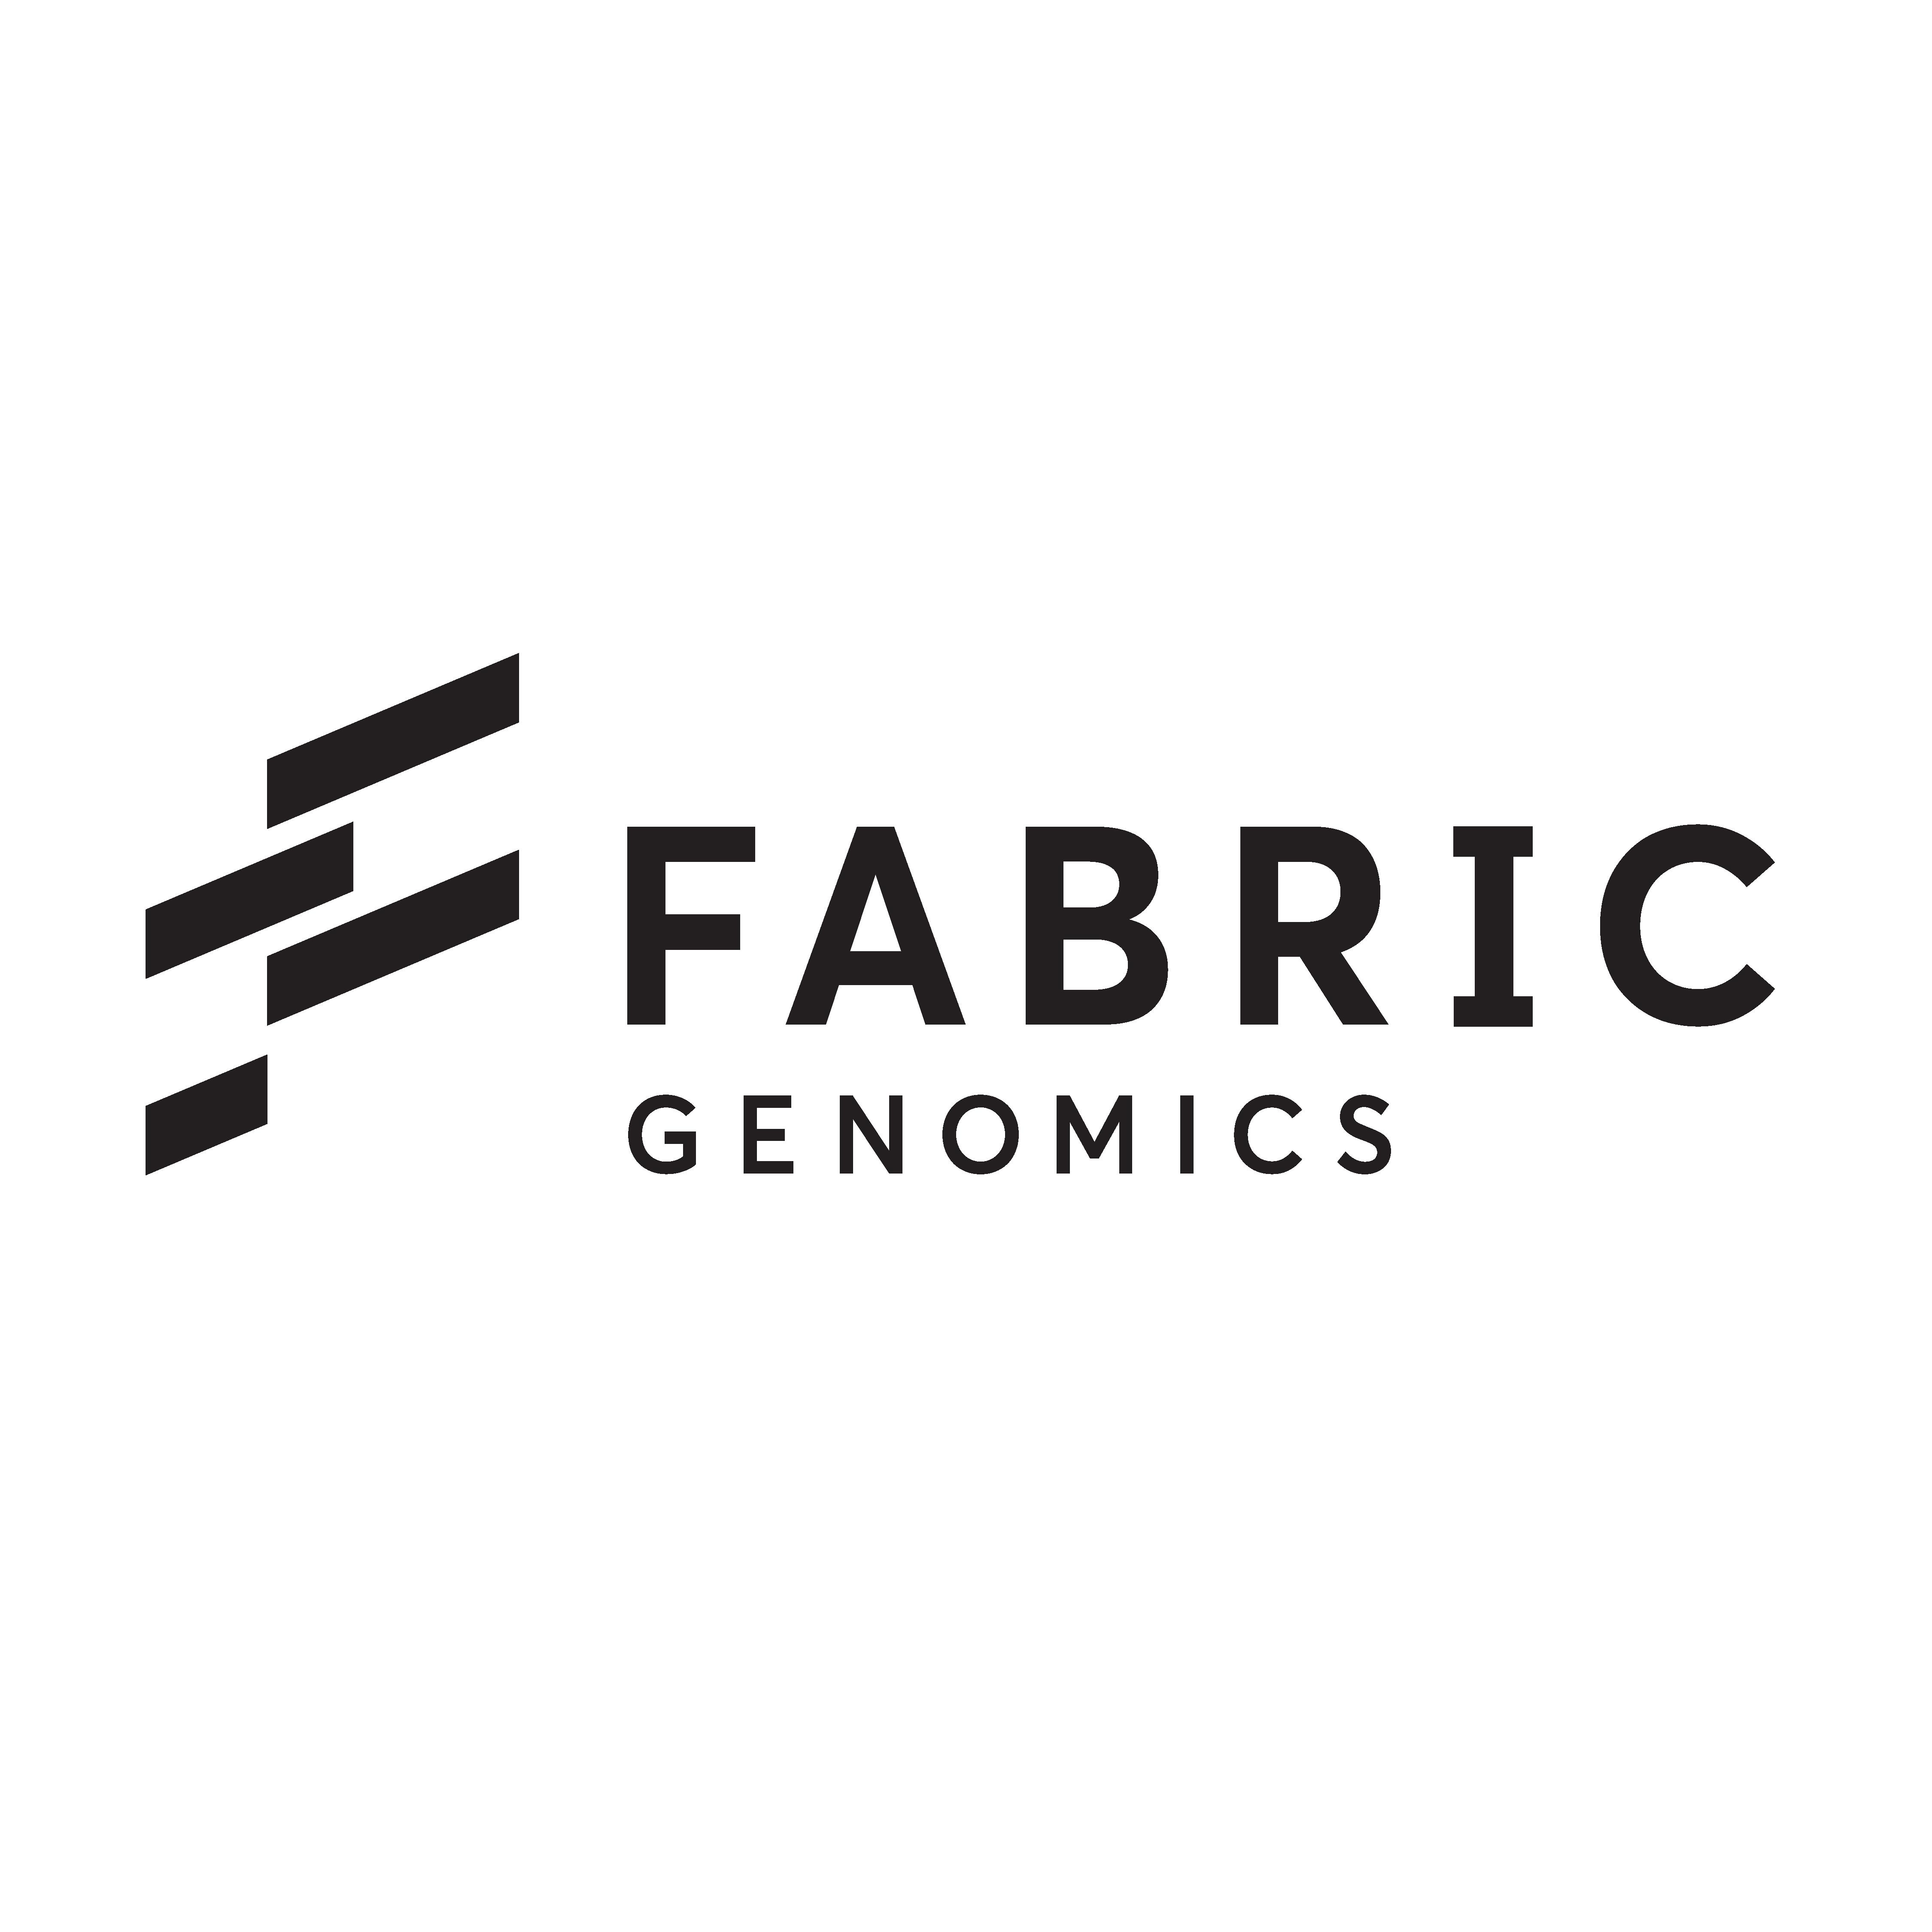 Fabric Genomics